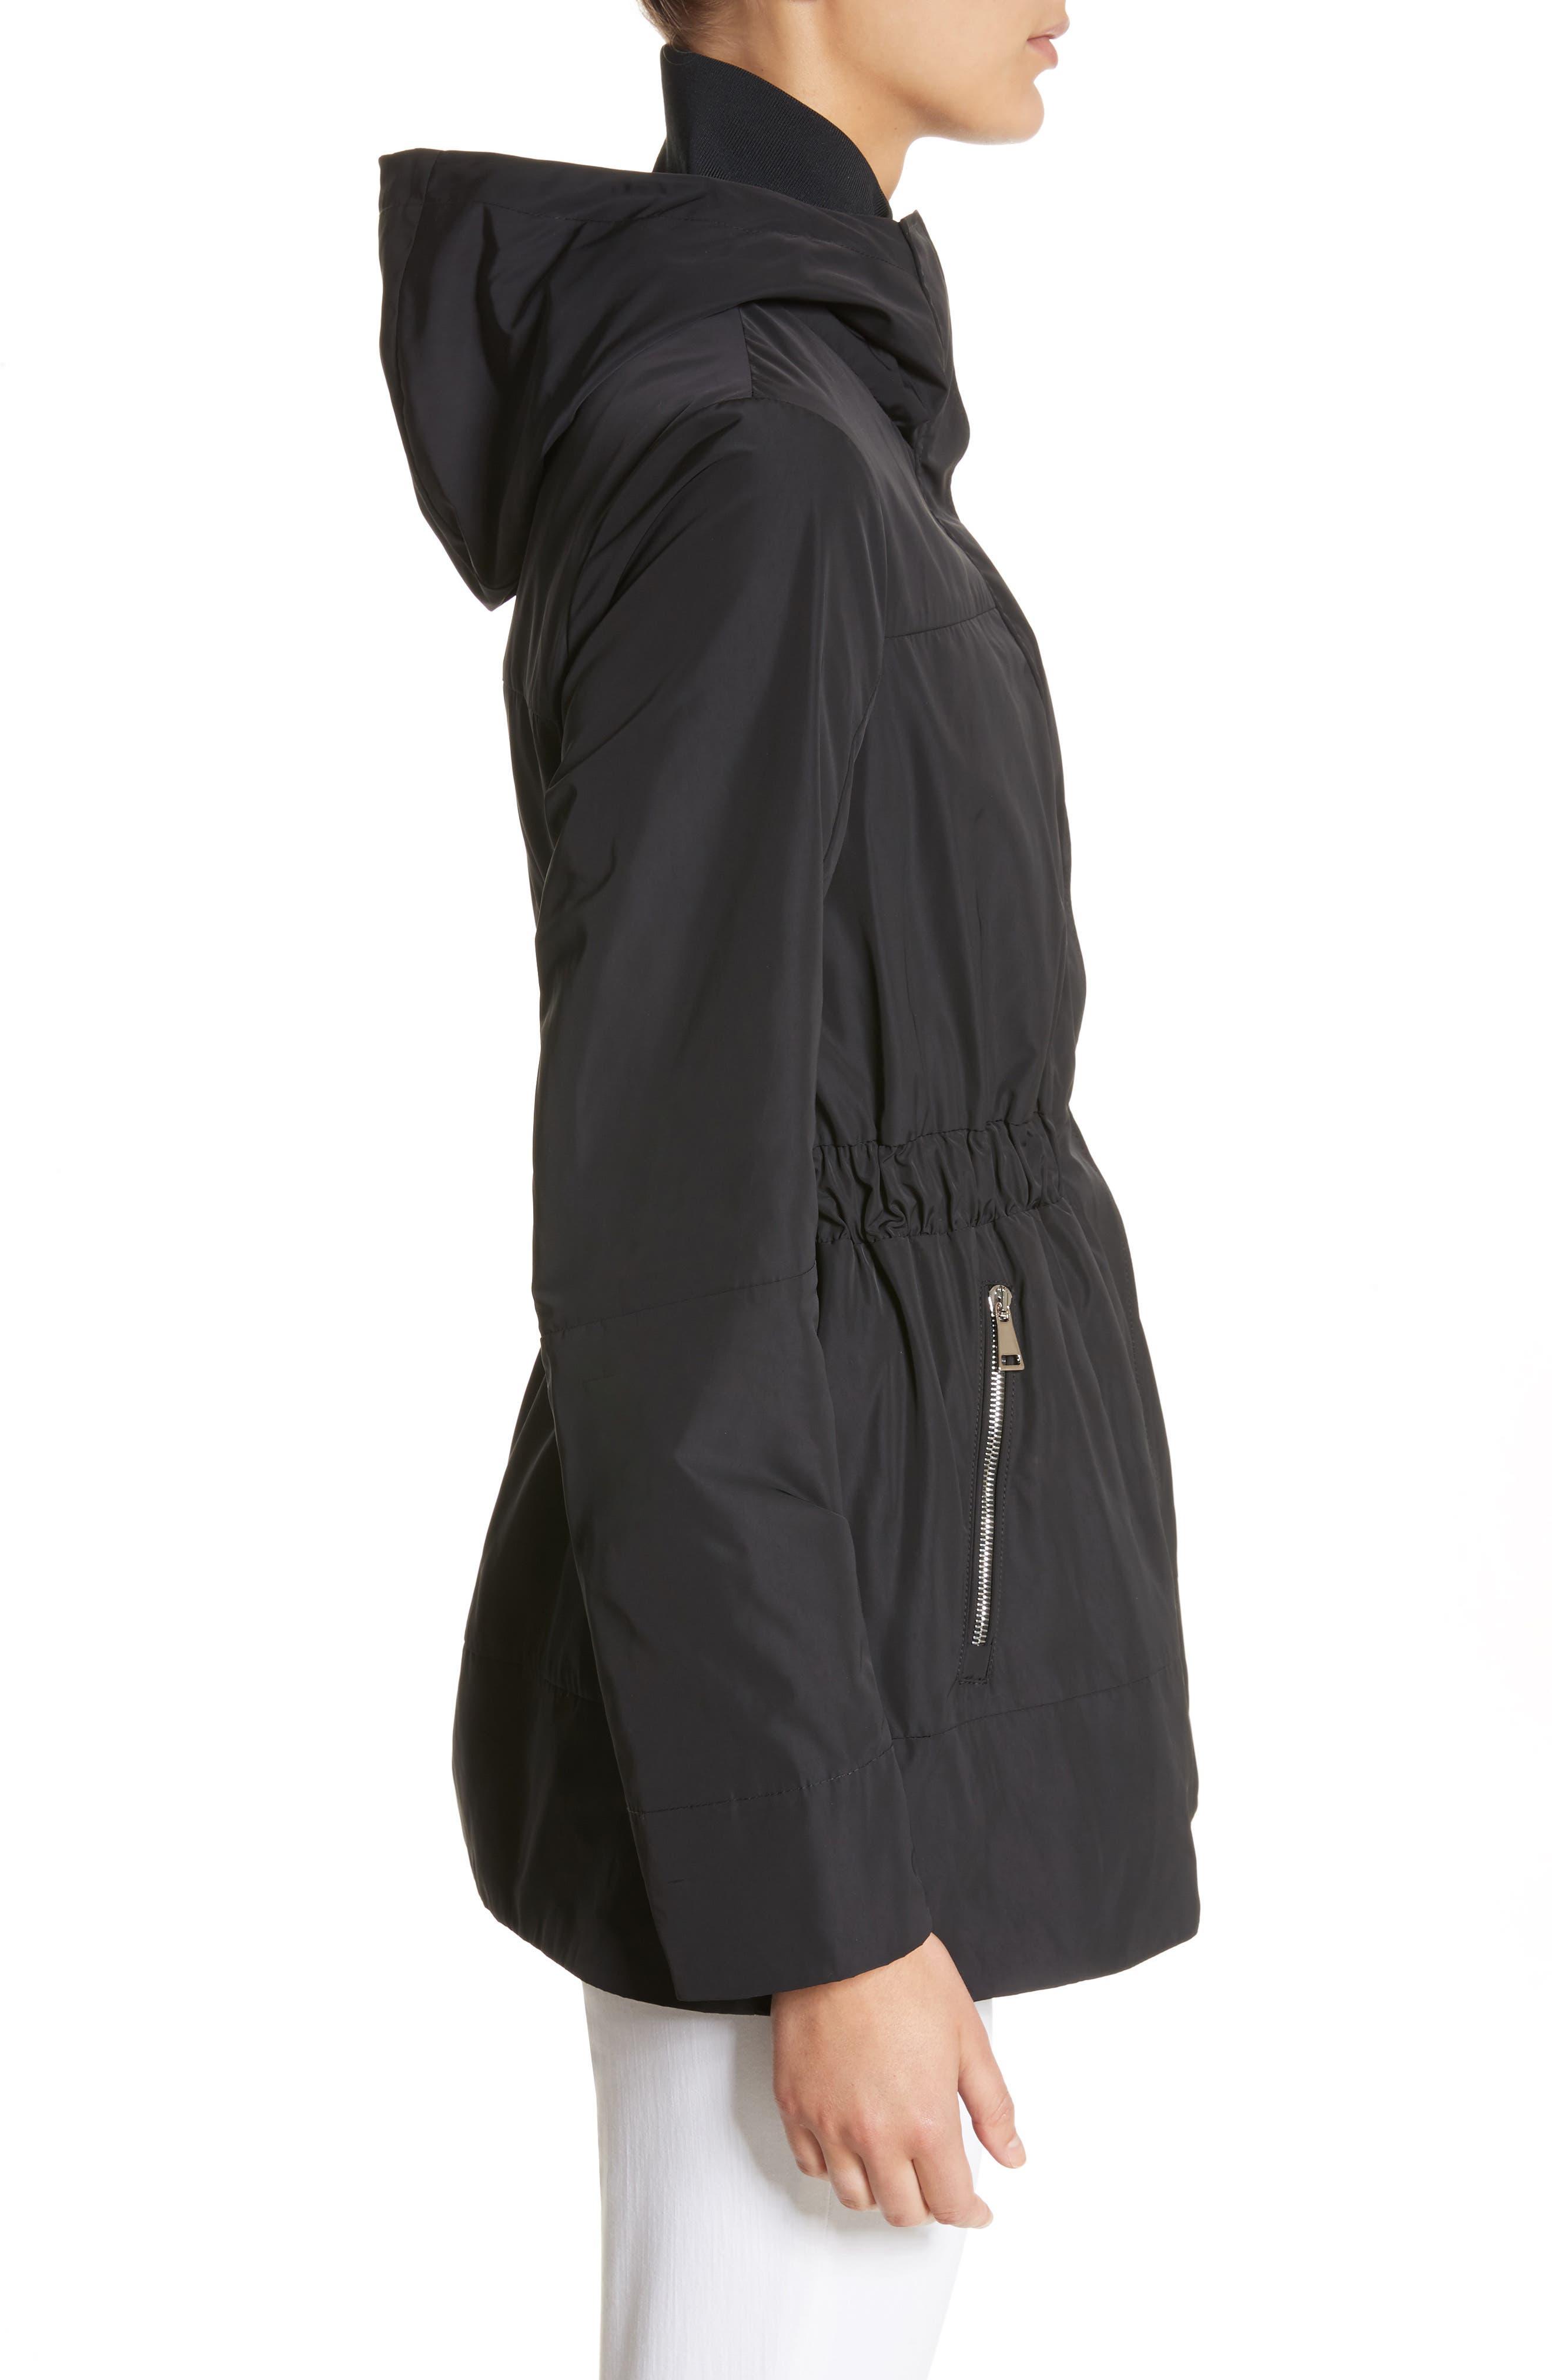 Alternate Image 3  - Moncler Disthene Water Resistant Hooded Jacket